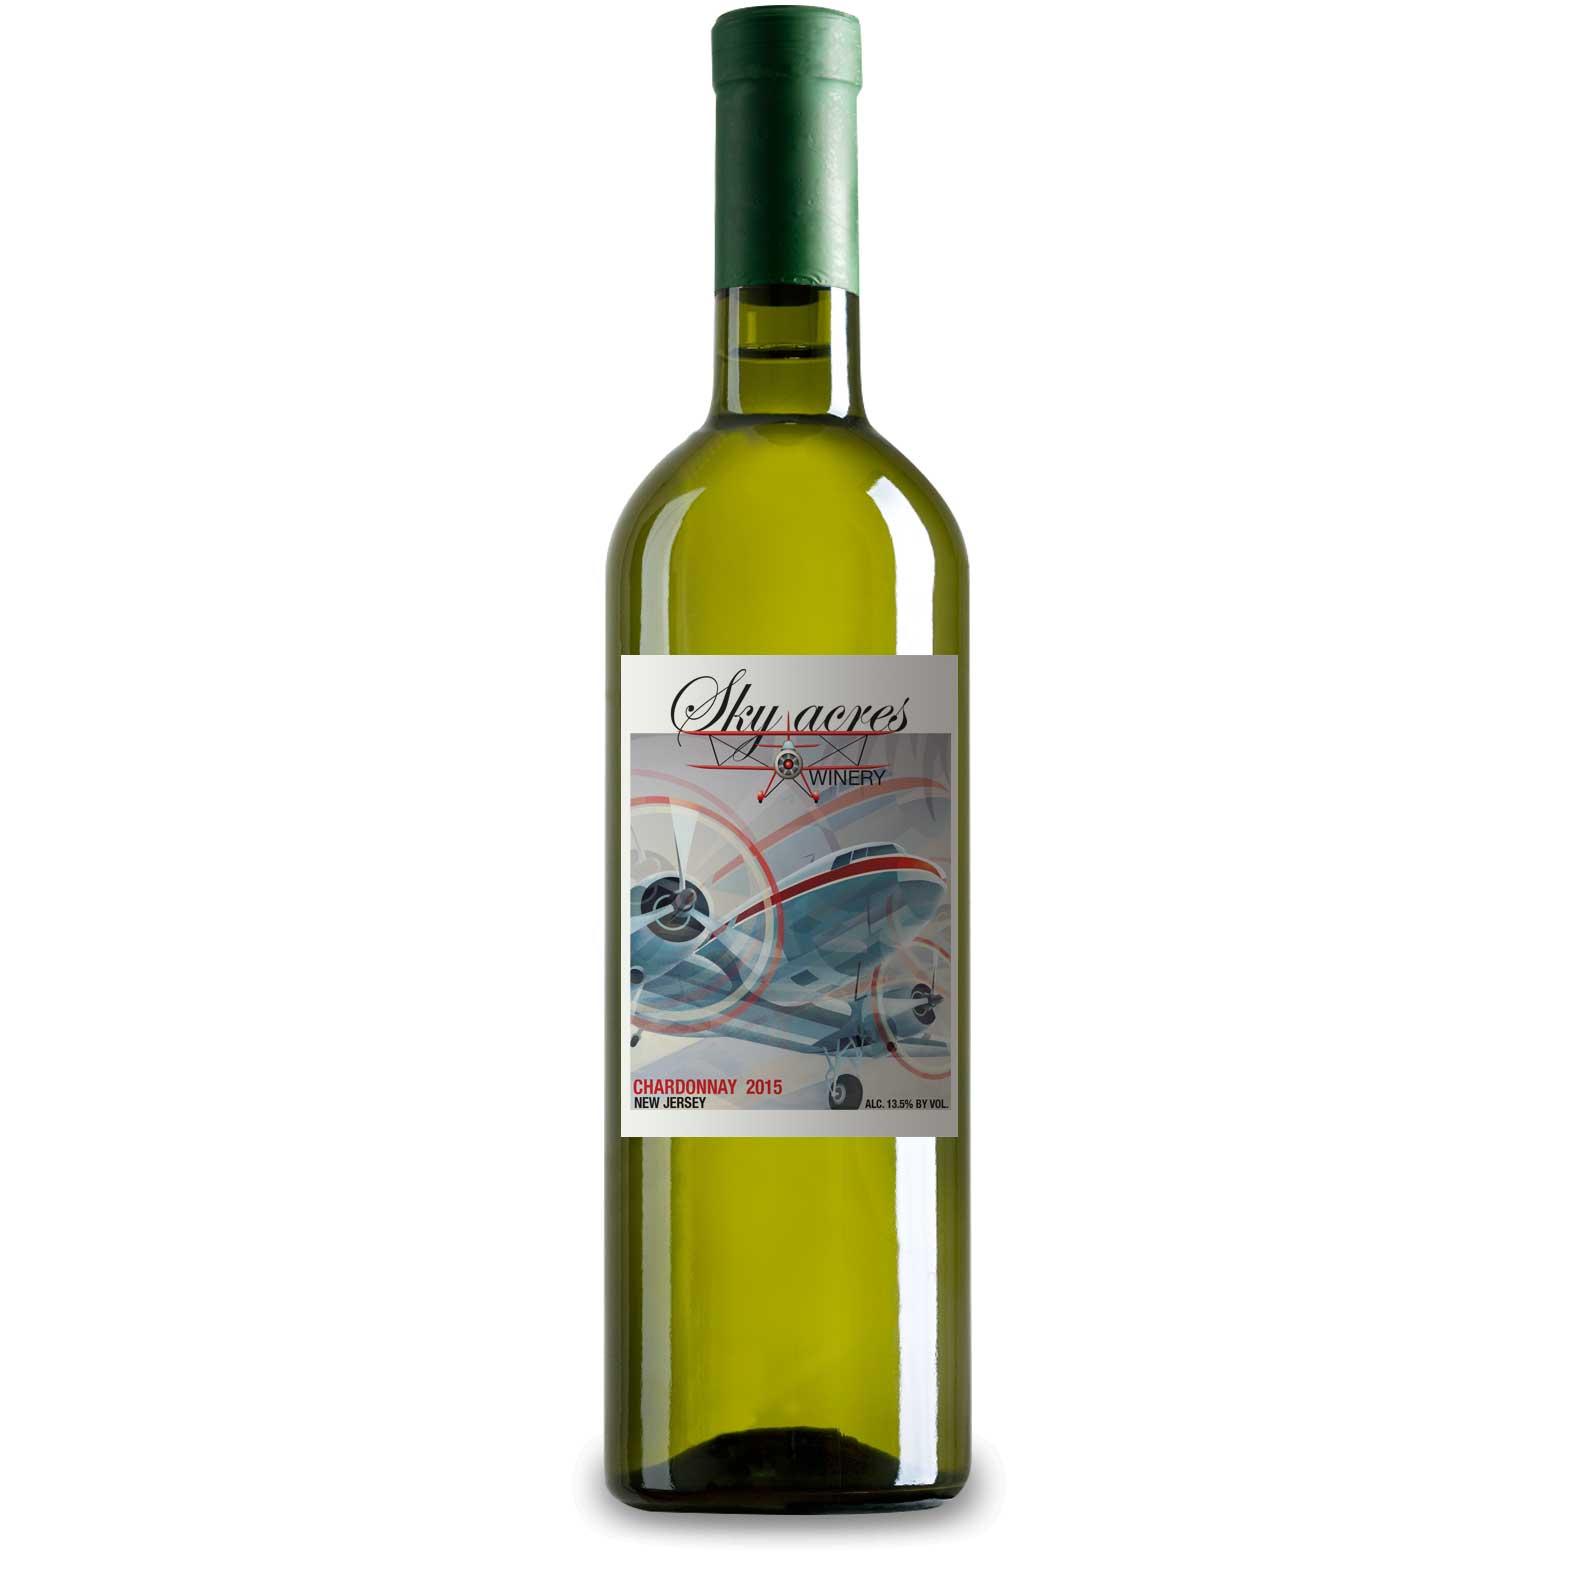 Sky Acres Chardonnay 2015